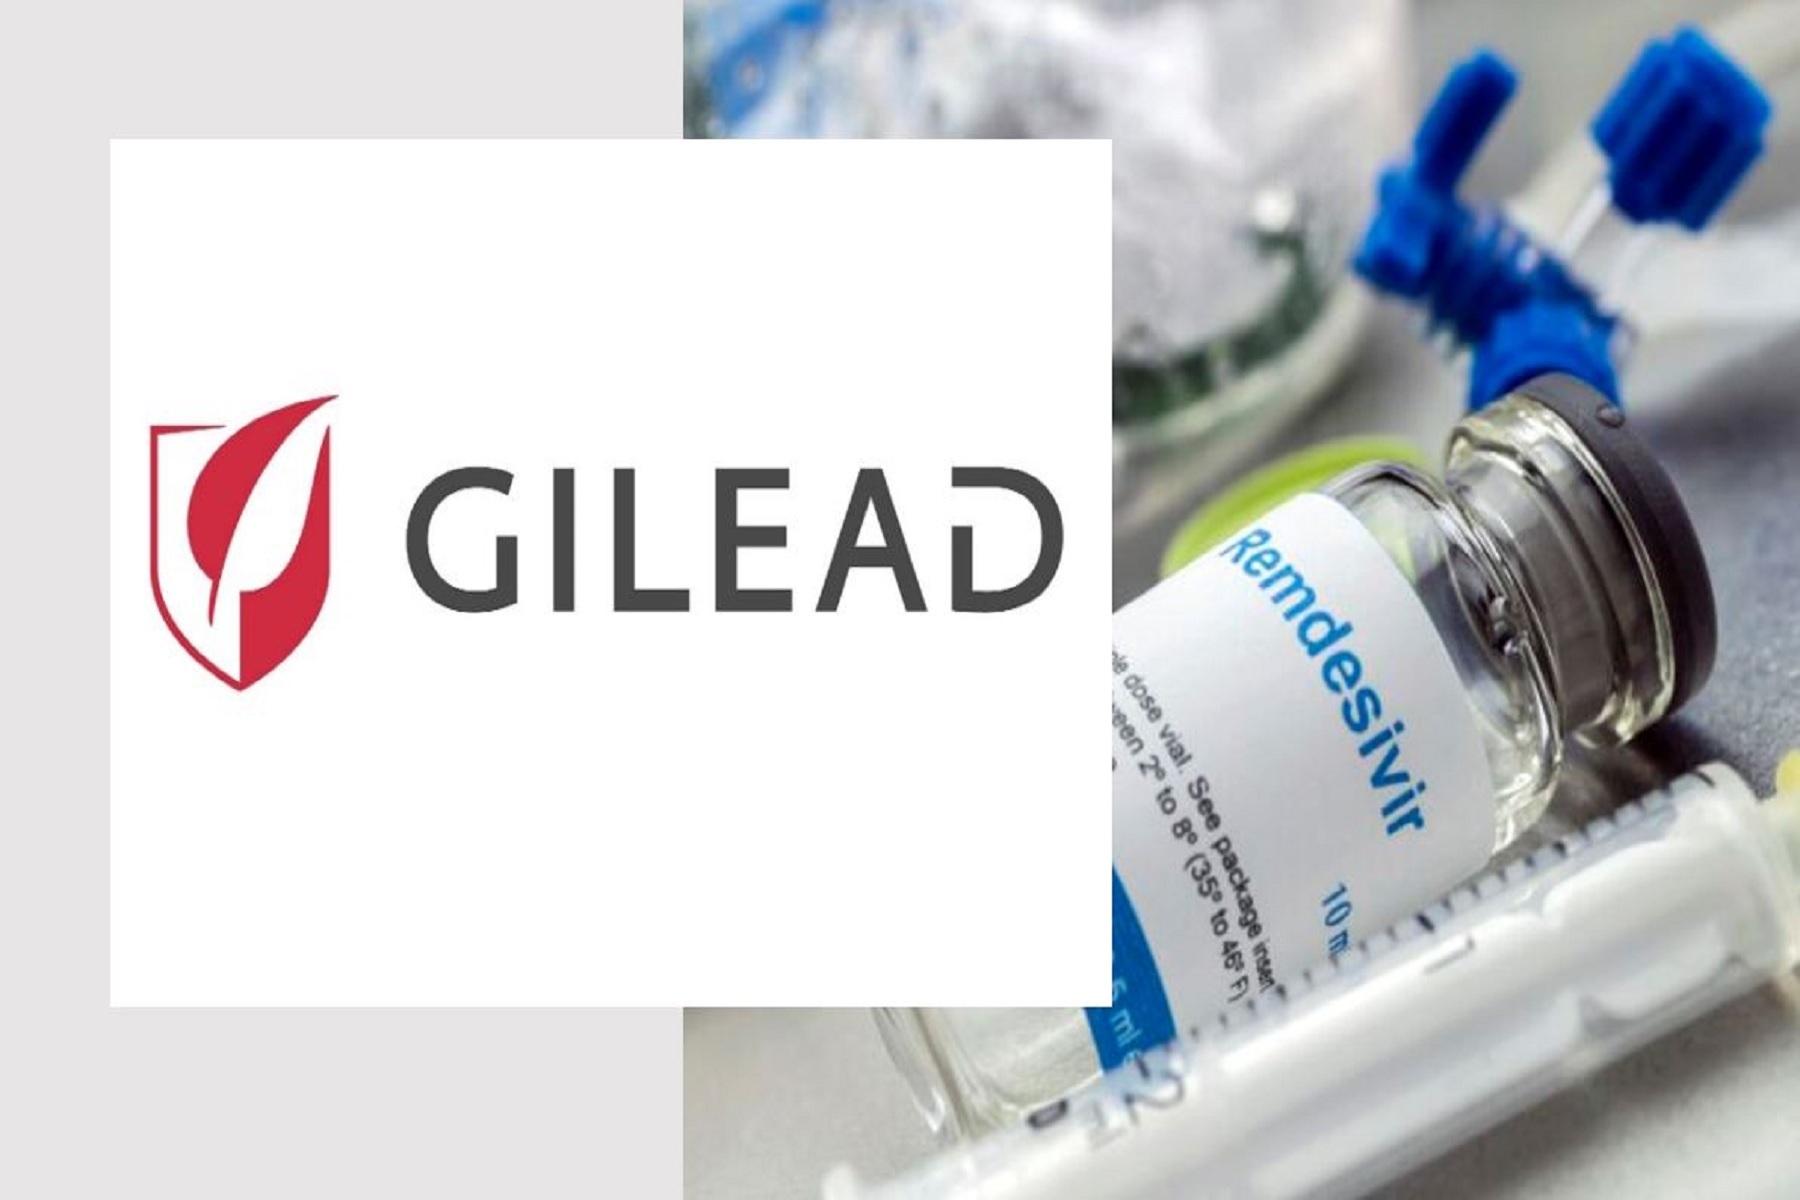 Gilead remdesivir διανομή: Η φαρμακοβιομηχανία αναλαμβάνει τον έλεγχο